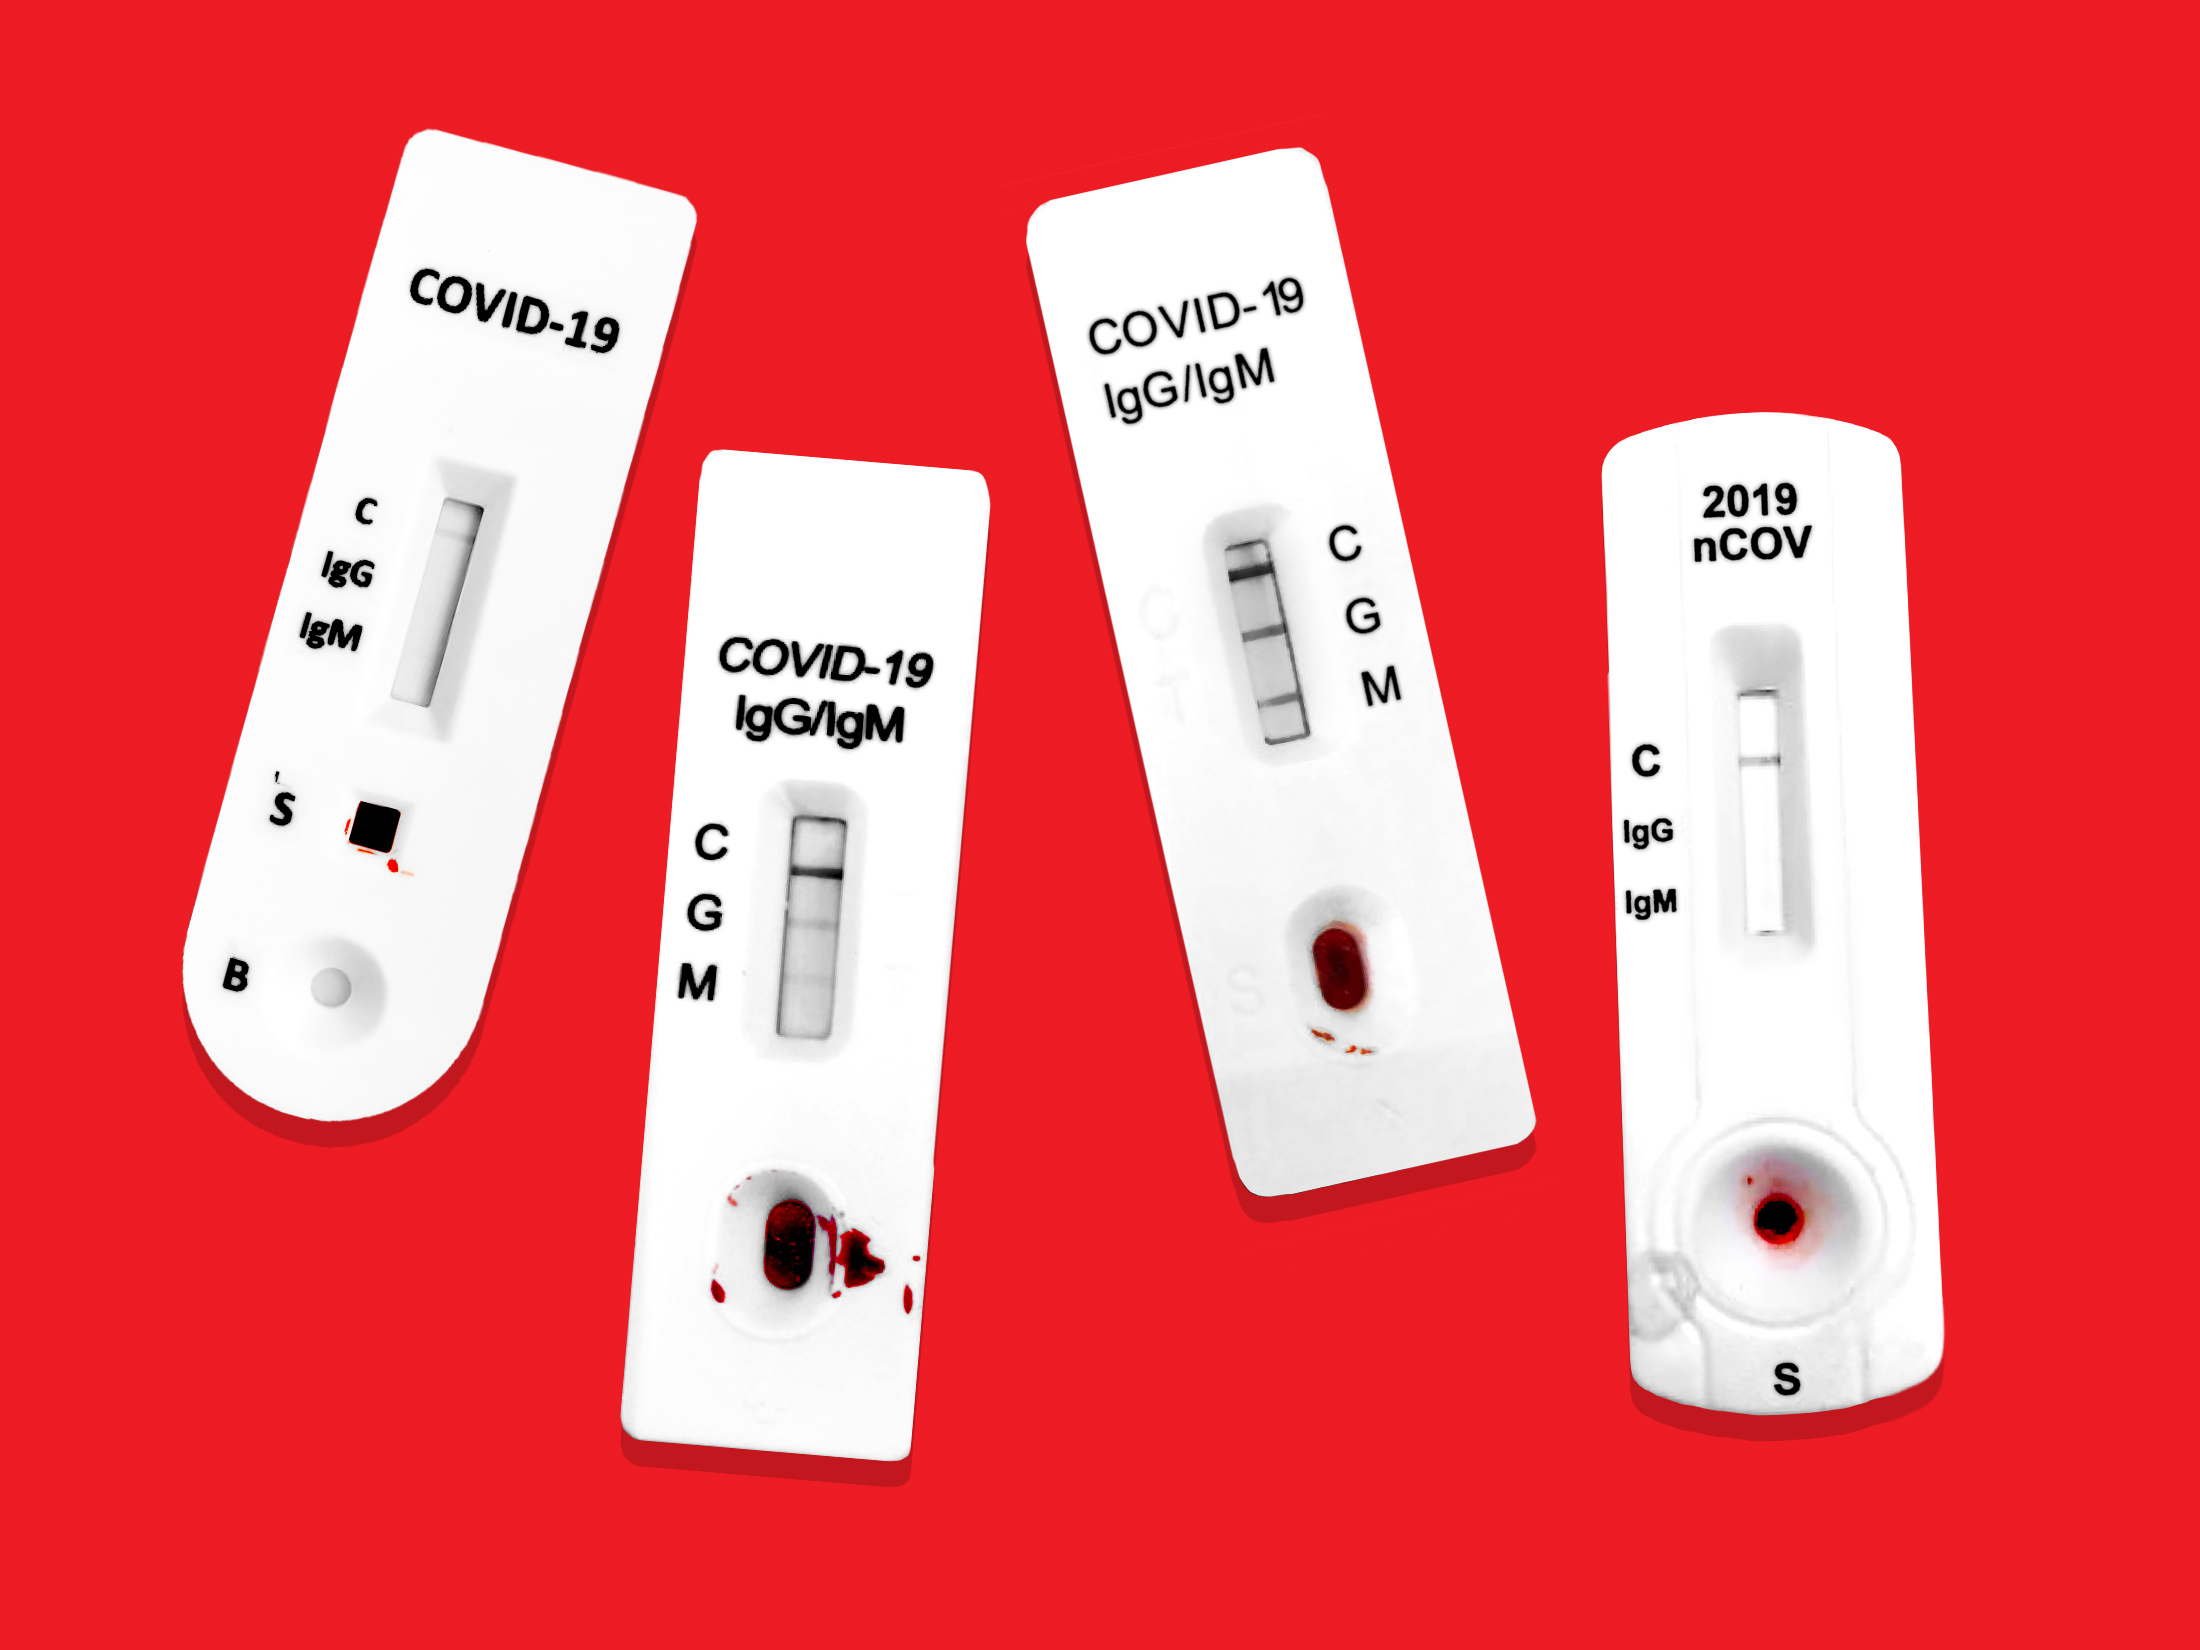 FDA Bans Some Spurious Antibody Tests